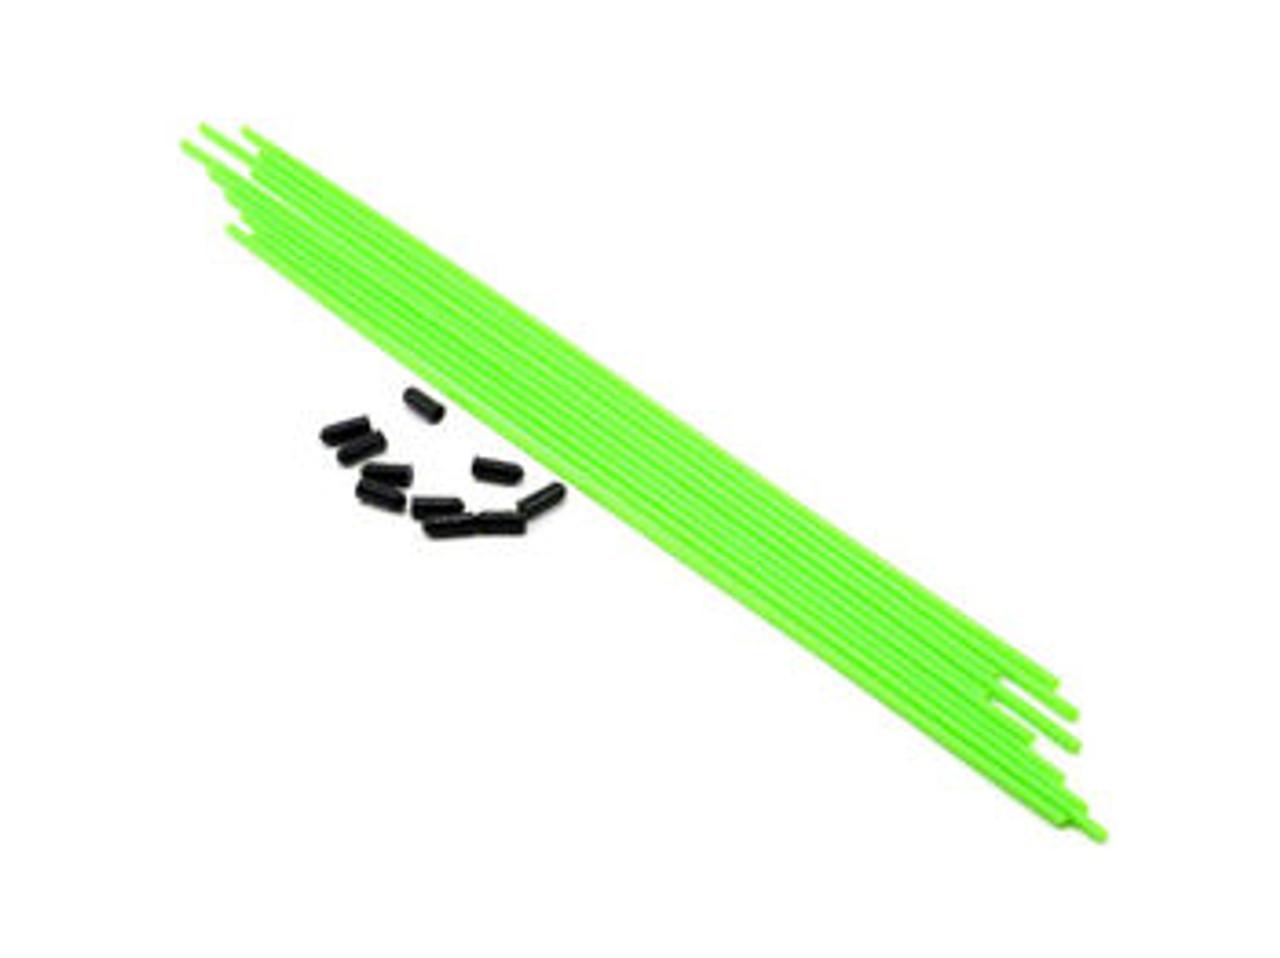 JQRacing Antenna Tube (Green) 10pcs (JQA024)